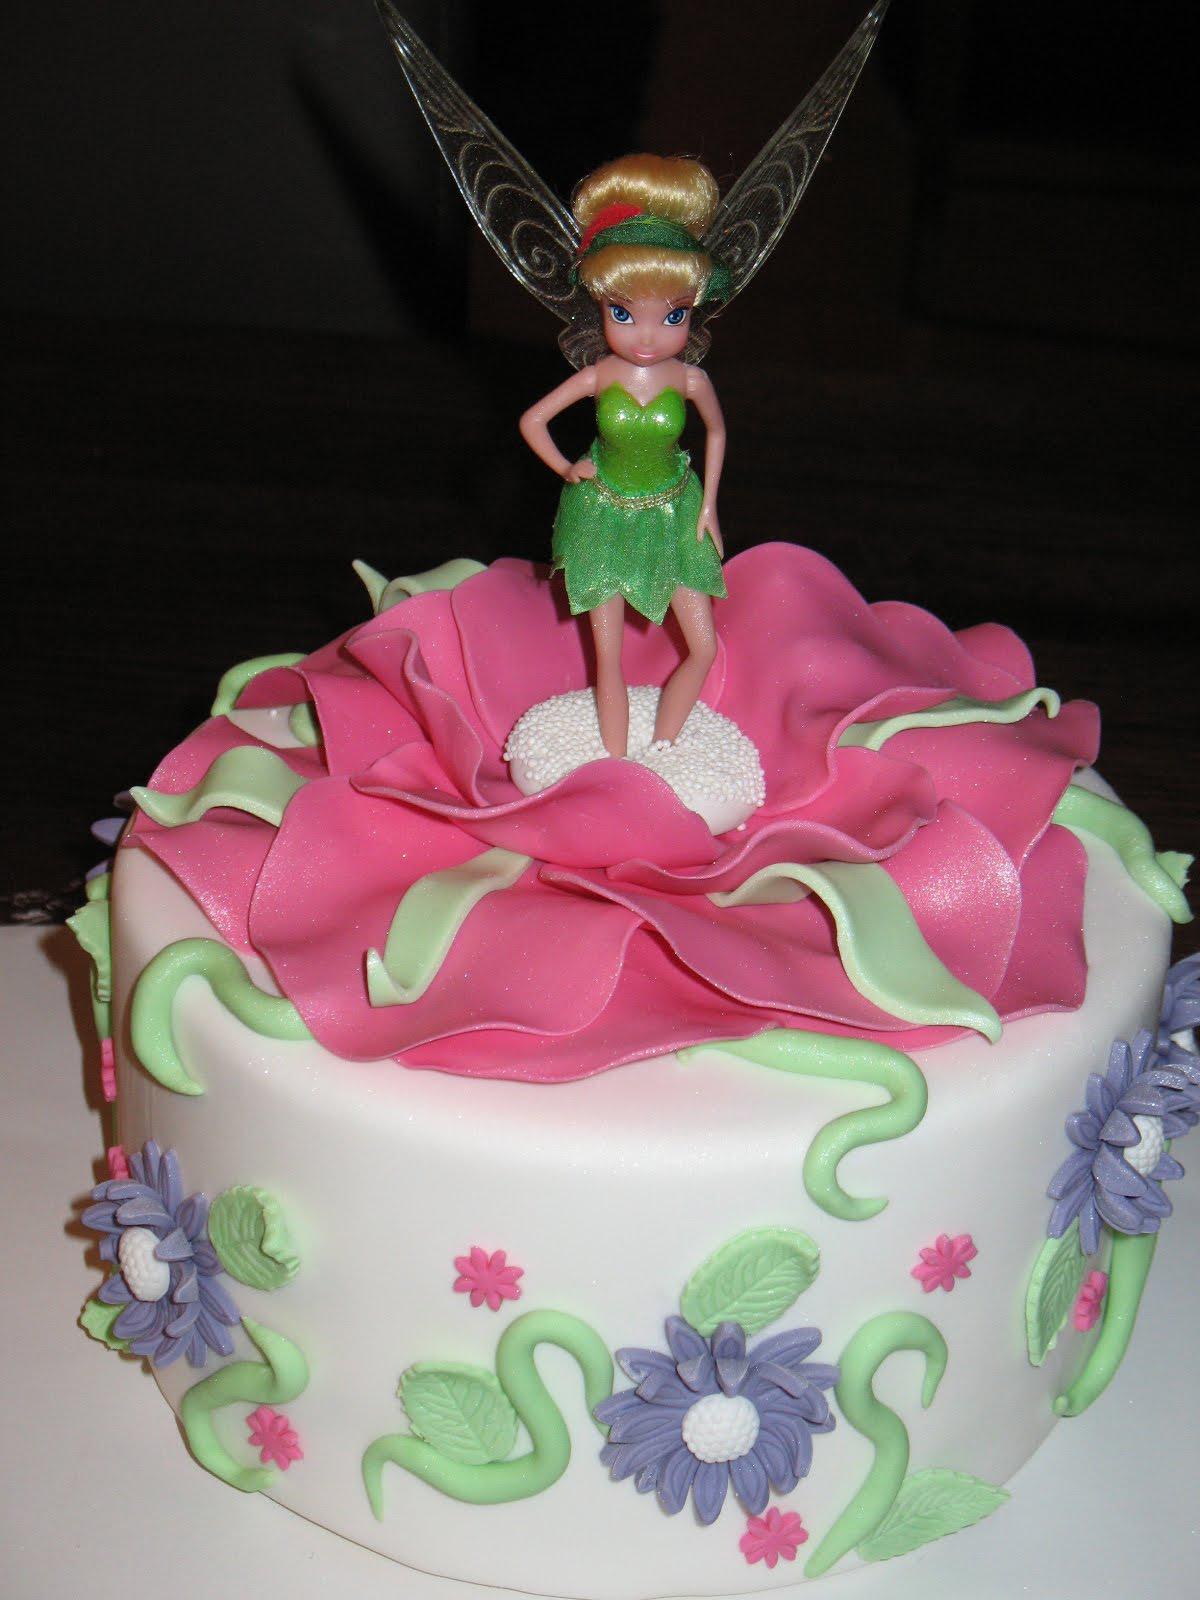 Sandy's Cakes: Tinkerbell Cake